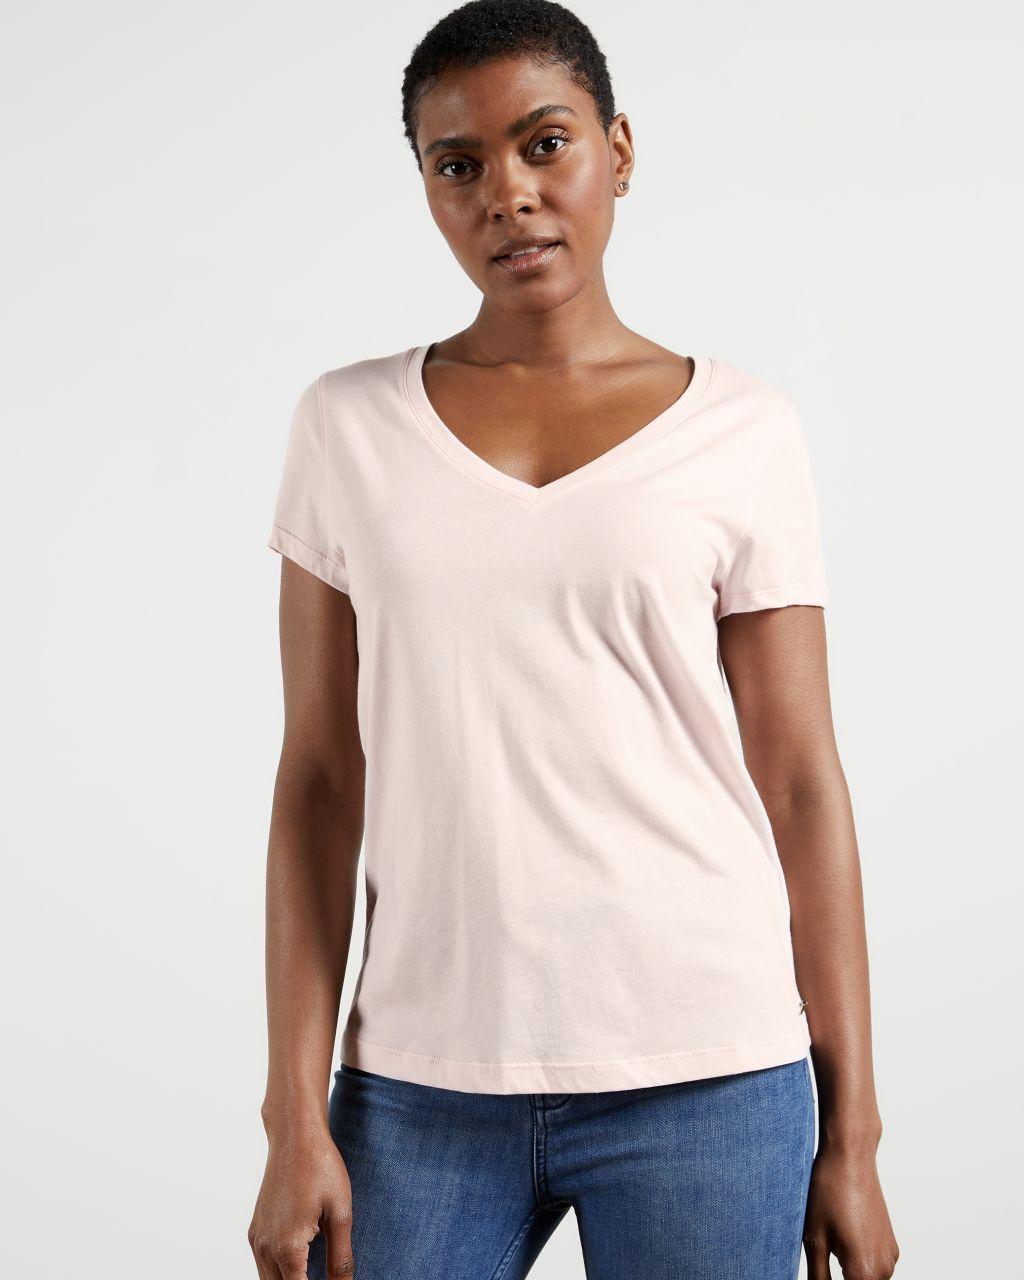 TED BAKER Lockeres T-shirt Mit V-ausschnitt   TED BAKER SALE